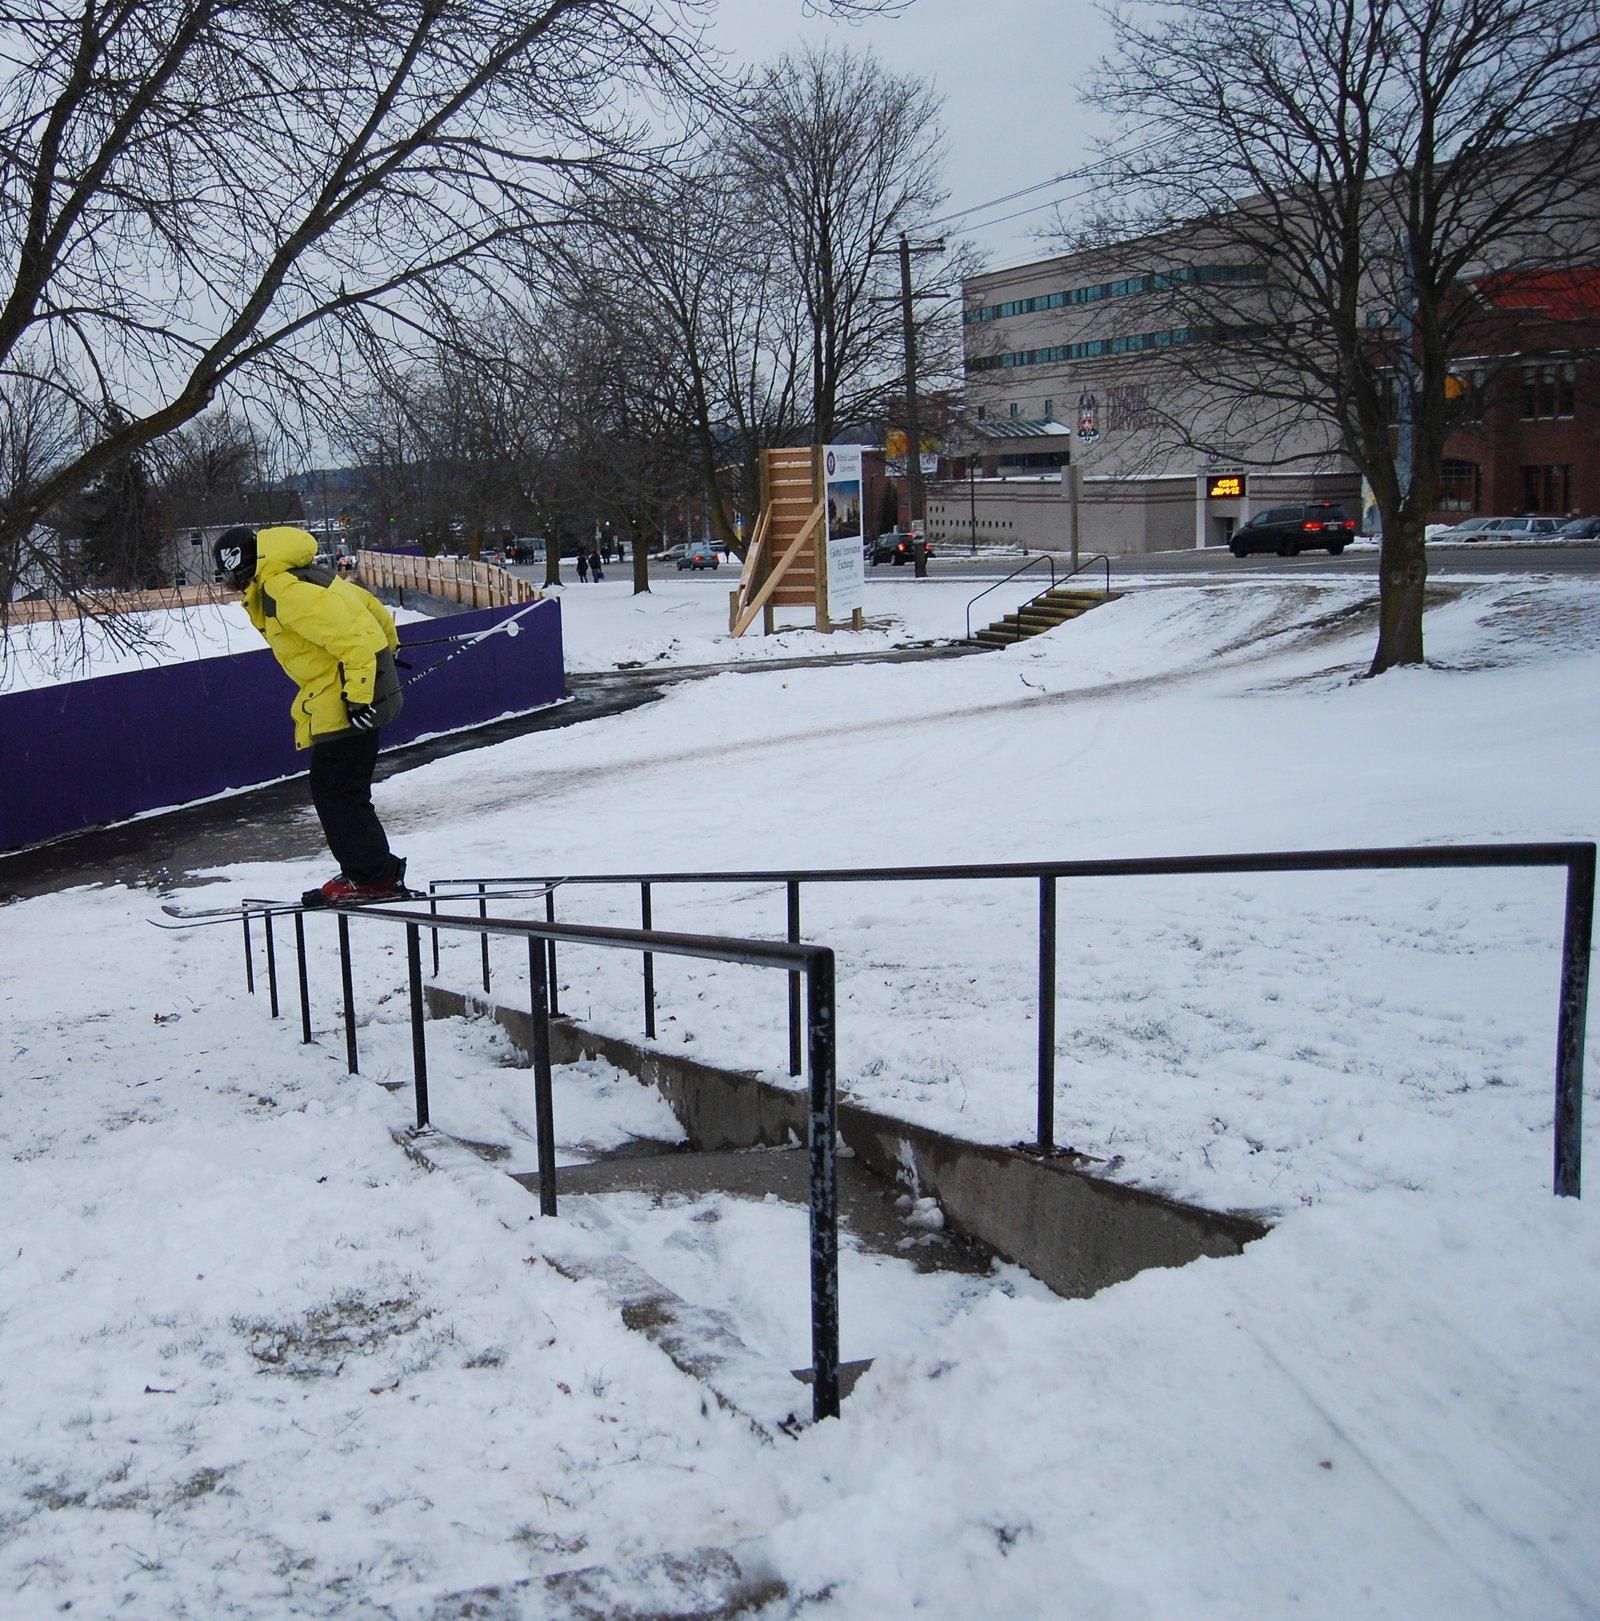 40 Foot Down Rail